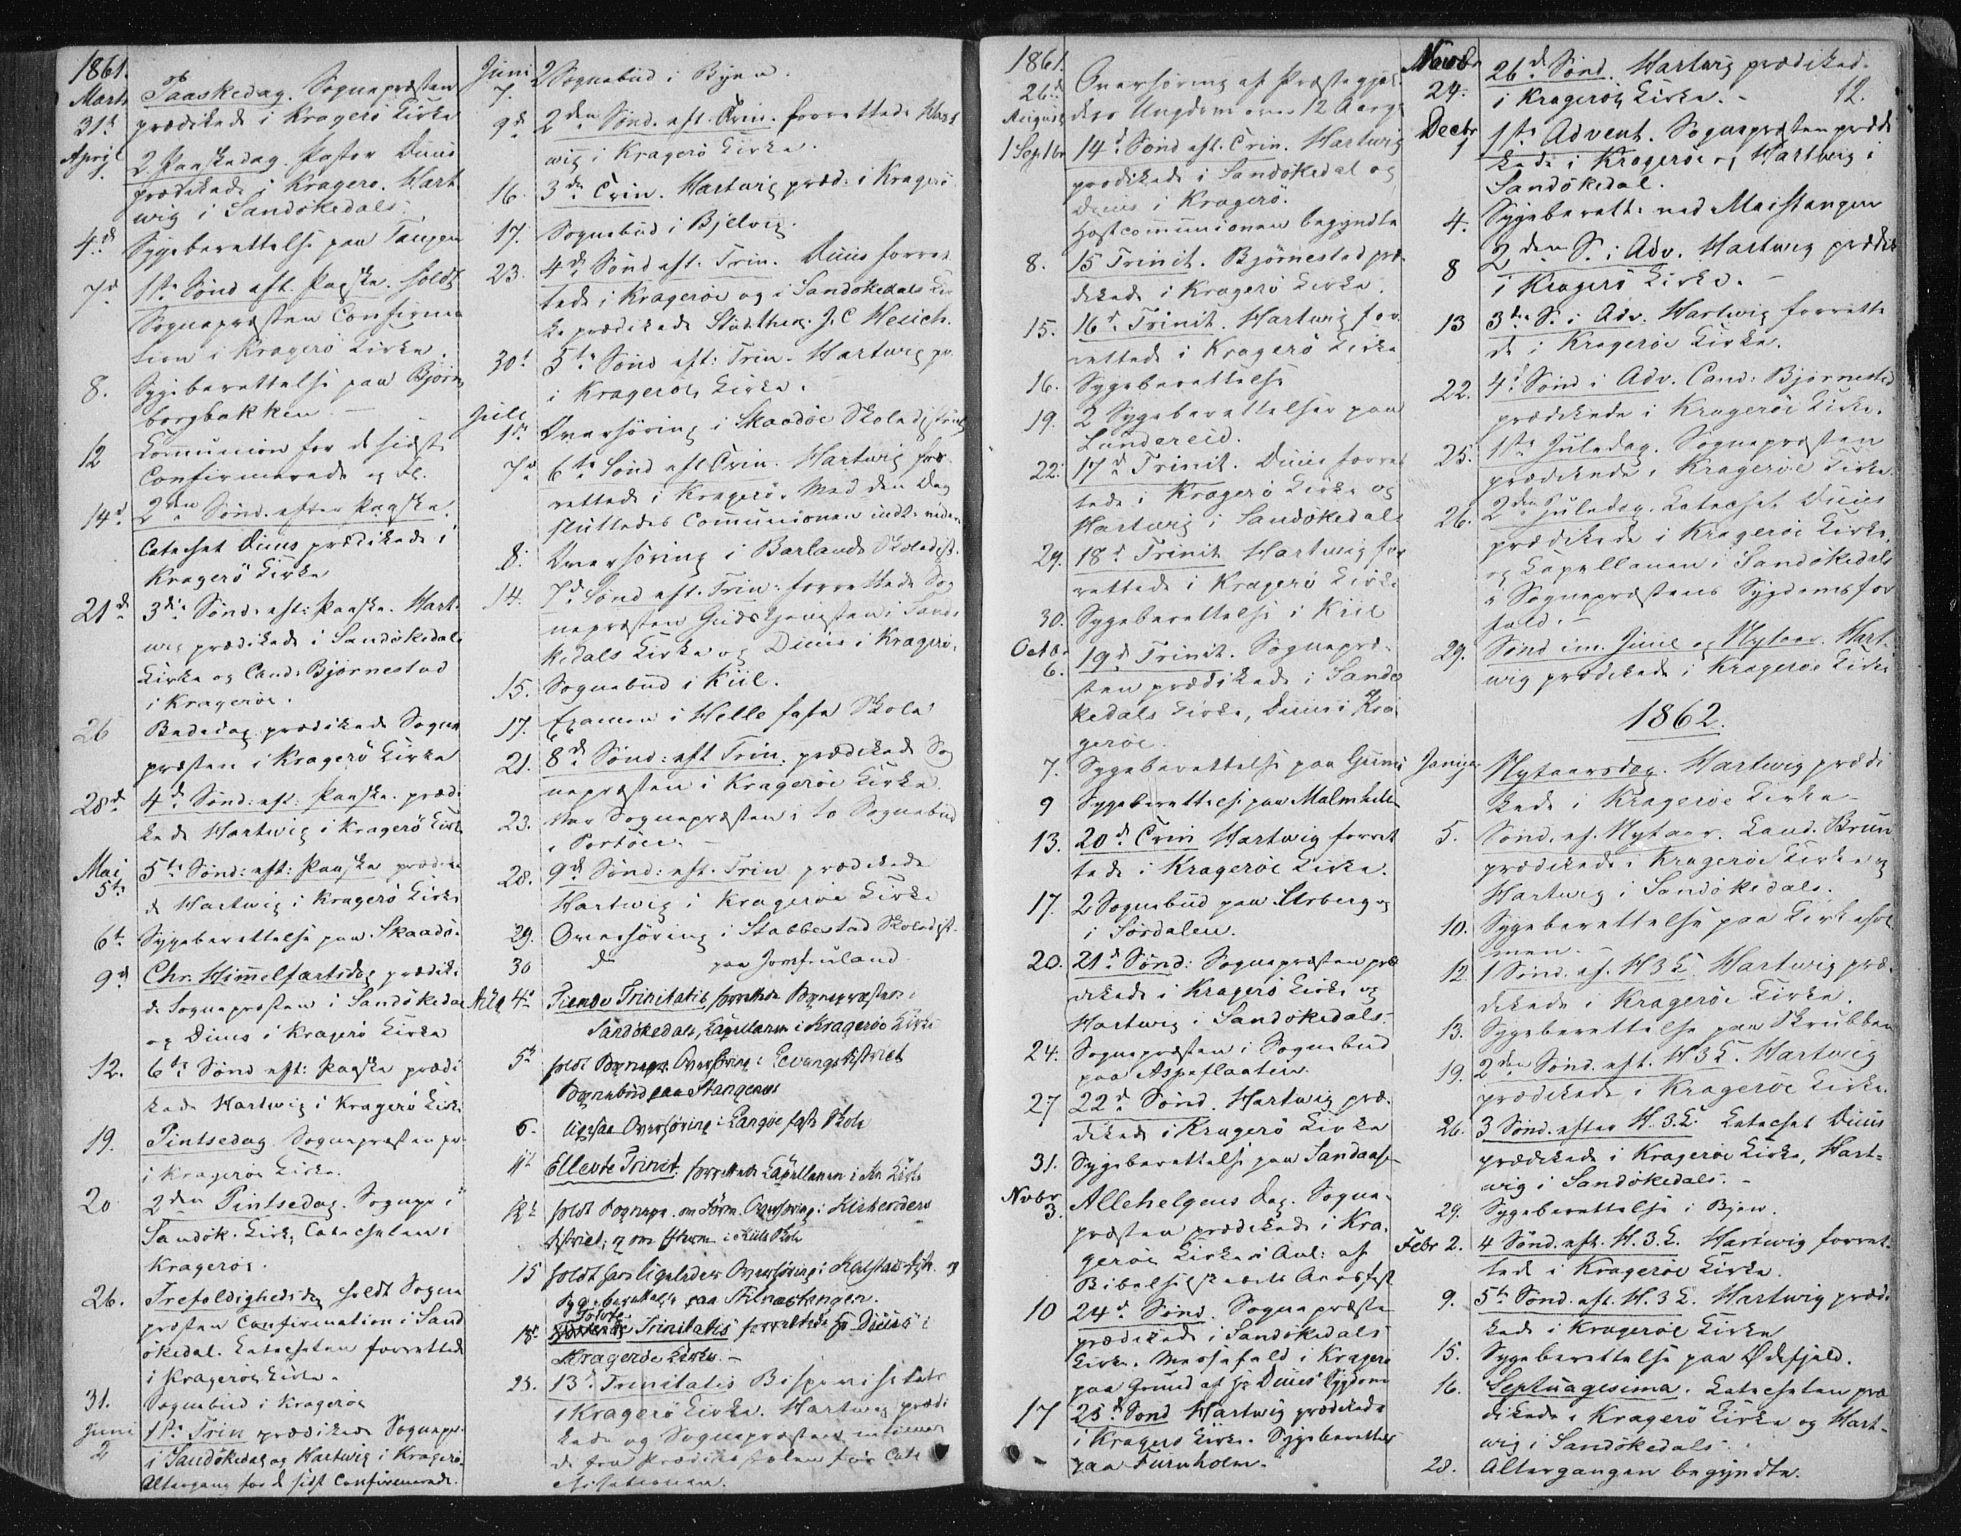 SAKO, Kragerø kirkebøker, F/Fa/L0006: Ministerialbok nr. 6, 1847-1861, s. 12